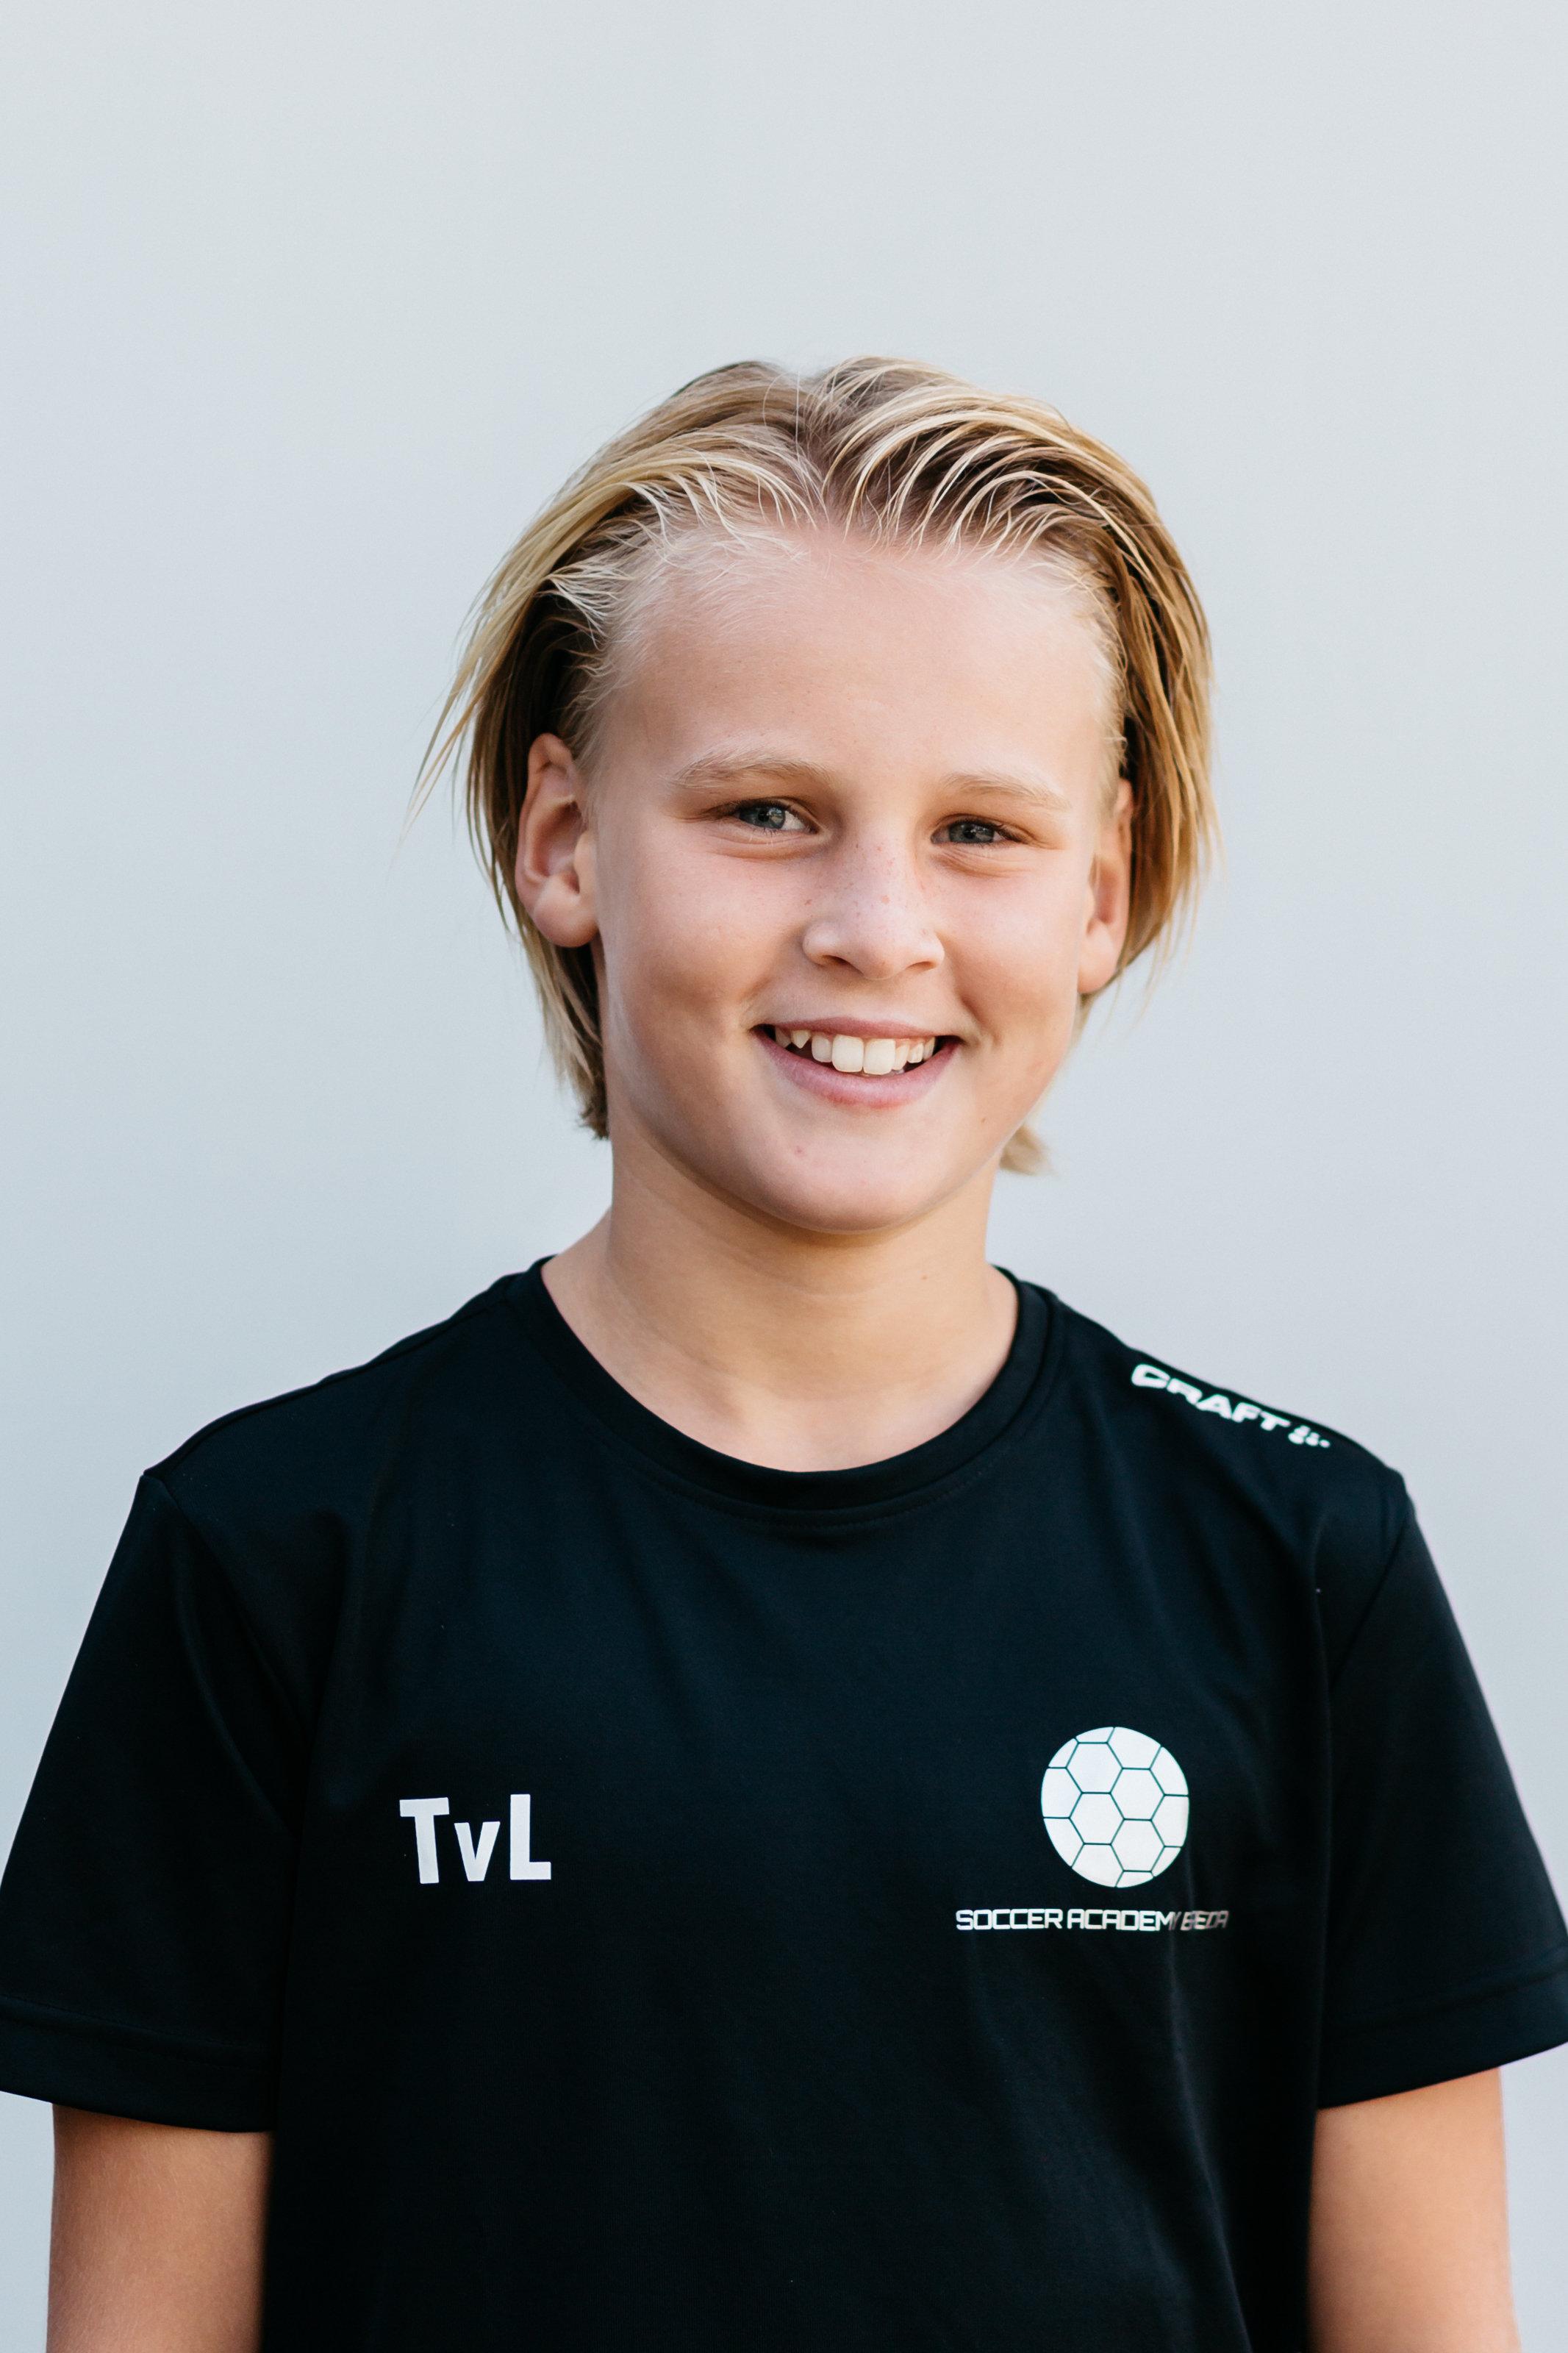 https://socceracademybreda.nl/wp-content/uploads/2020/10/thijs-van-leeuwen-teampagina.jpg